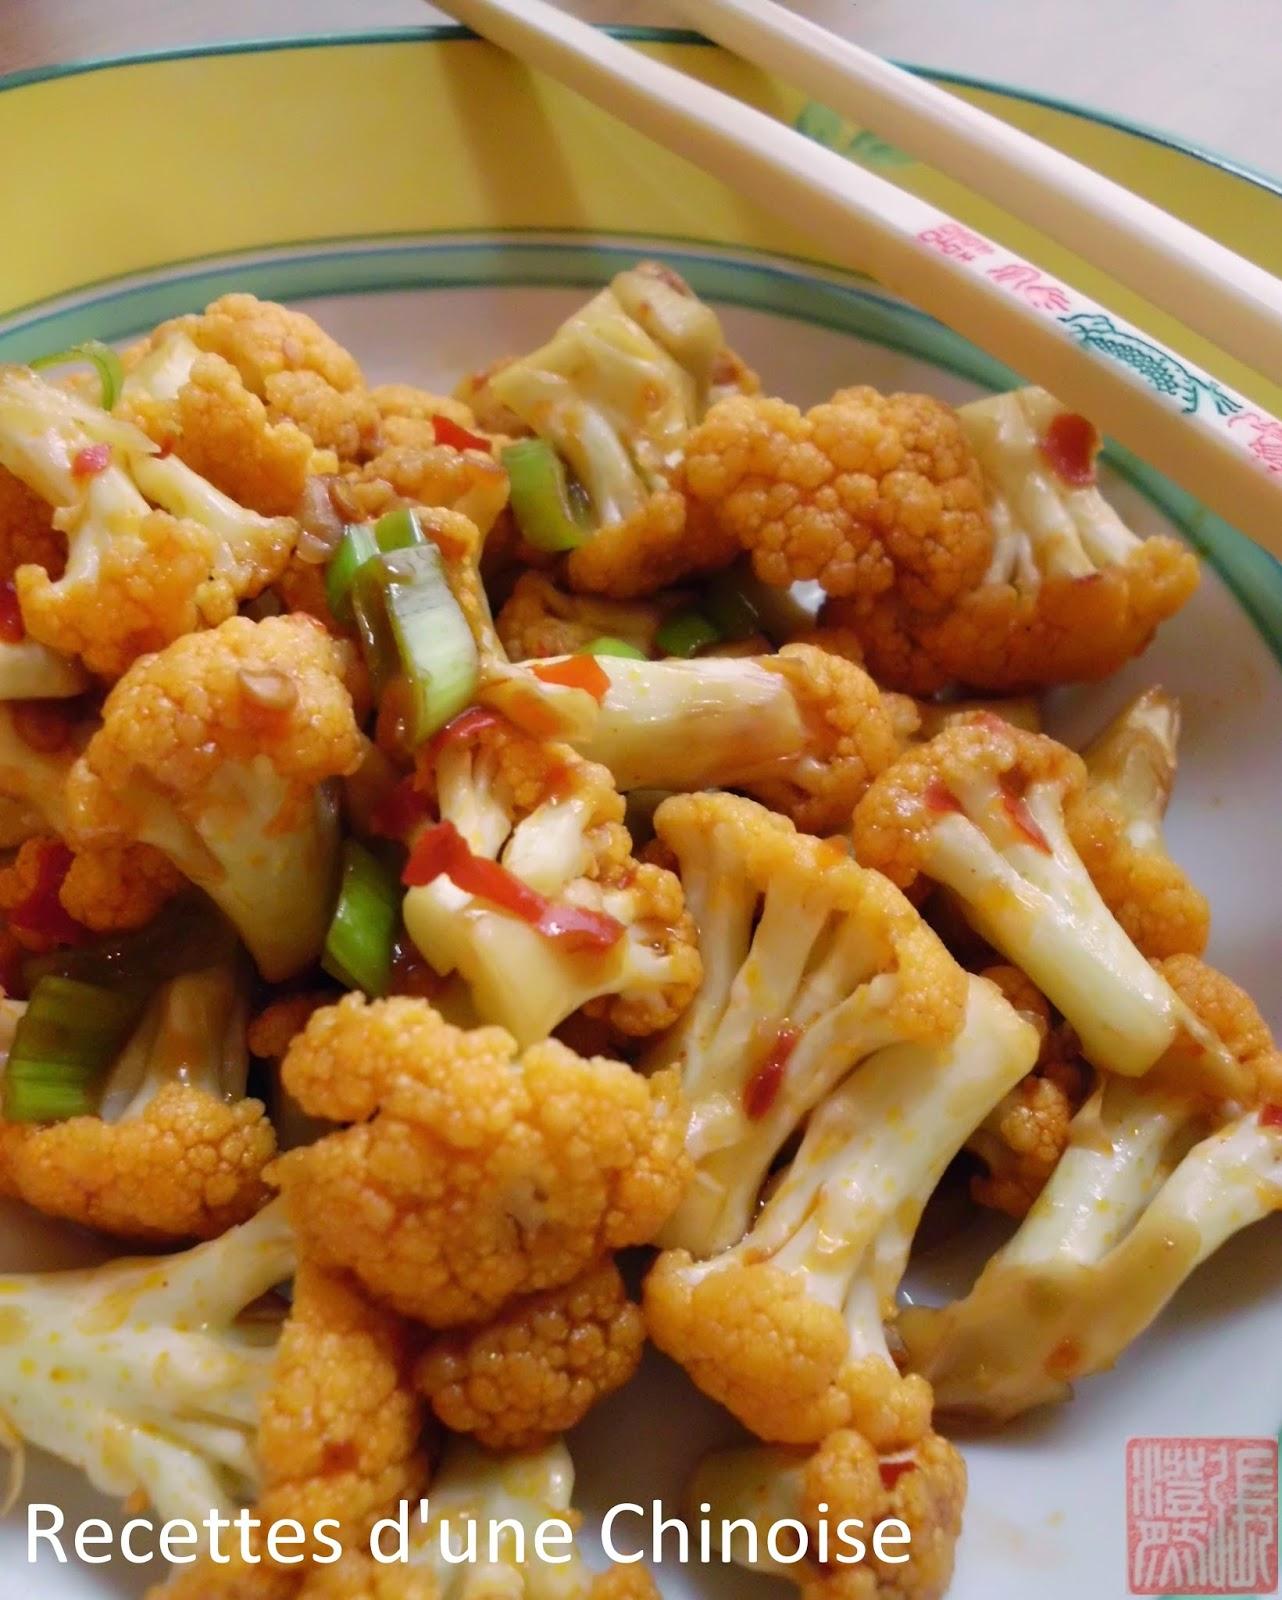 Recettes D Une Chinoise Spicy Chou Fleur Au Wok 干煸菜花 Ganbian